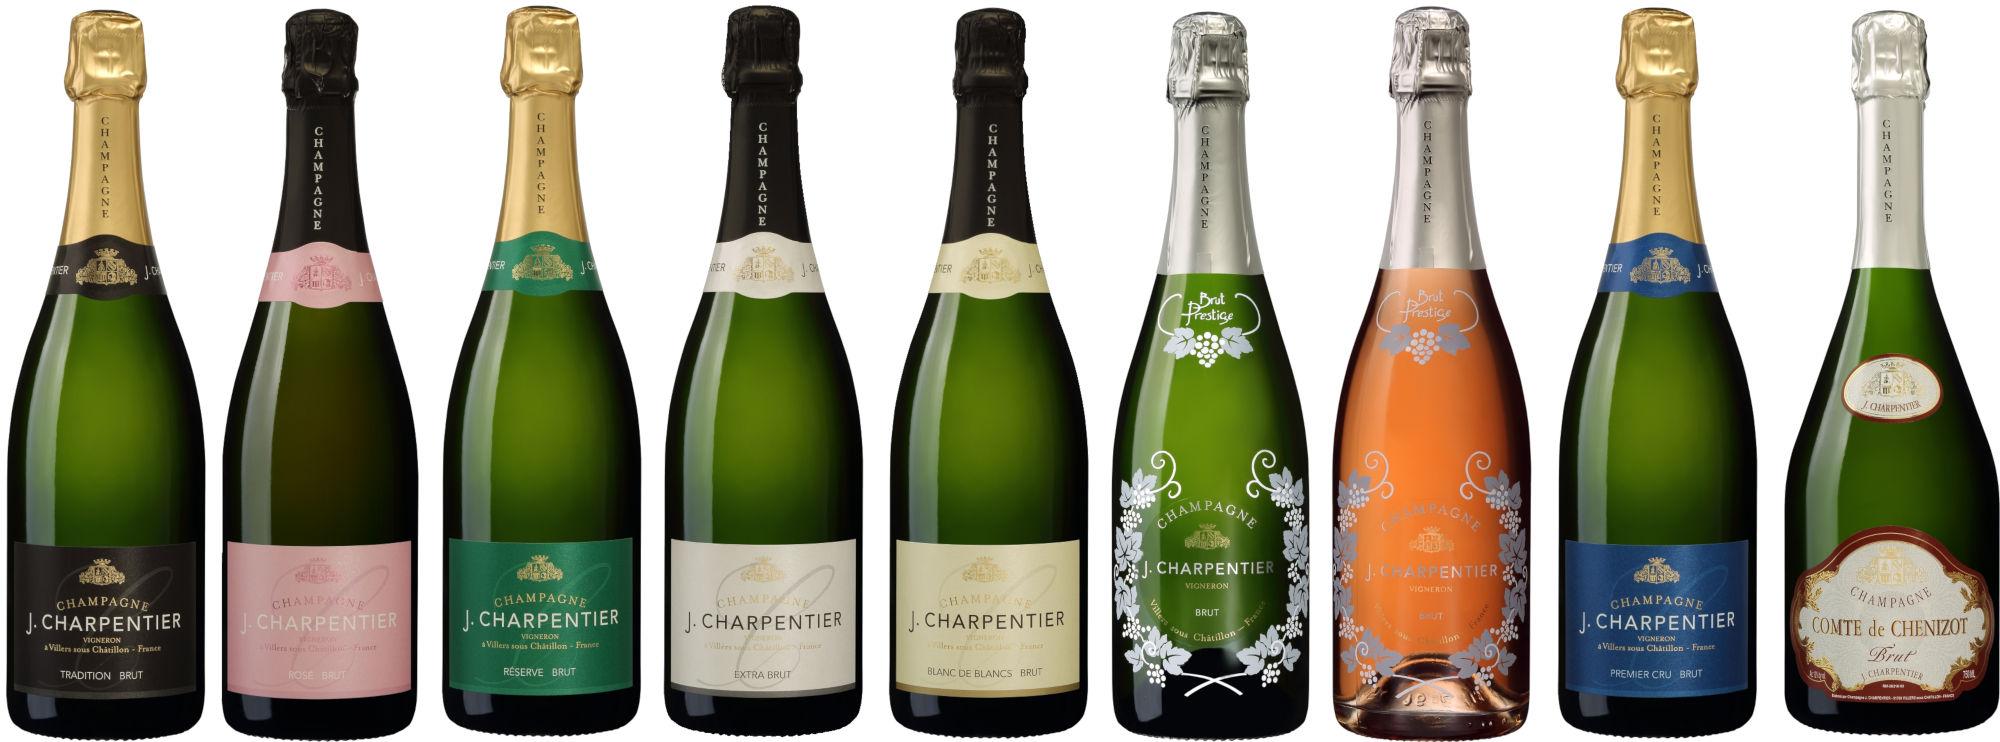 Champagner J. Charpentier